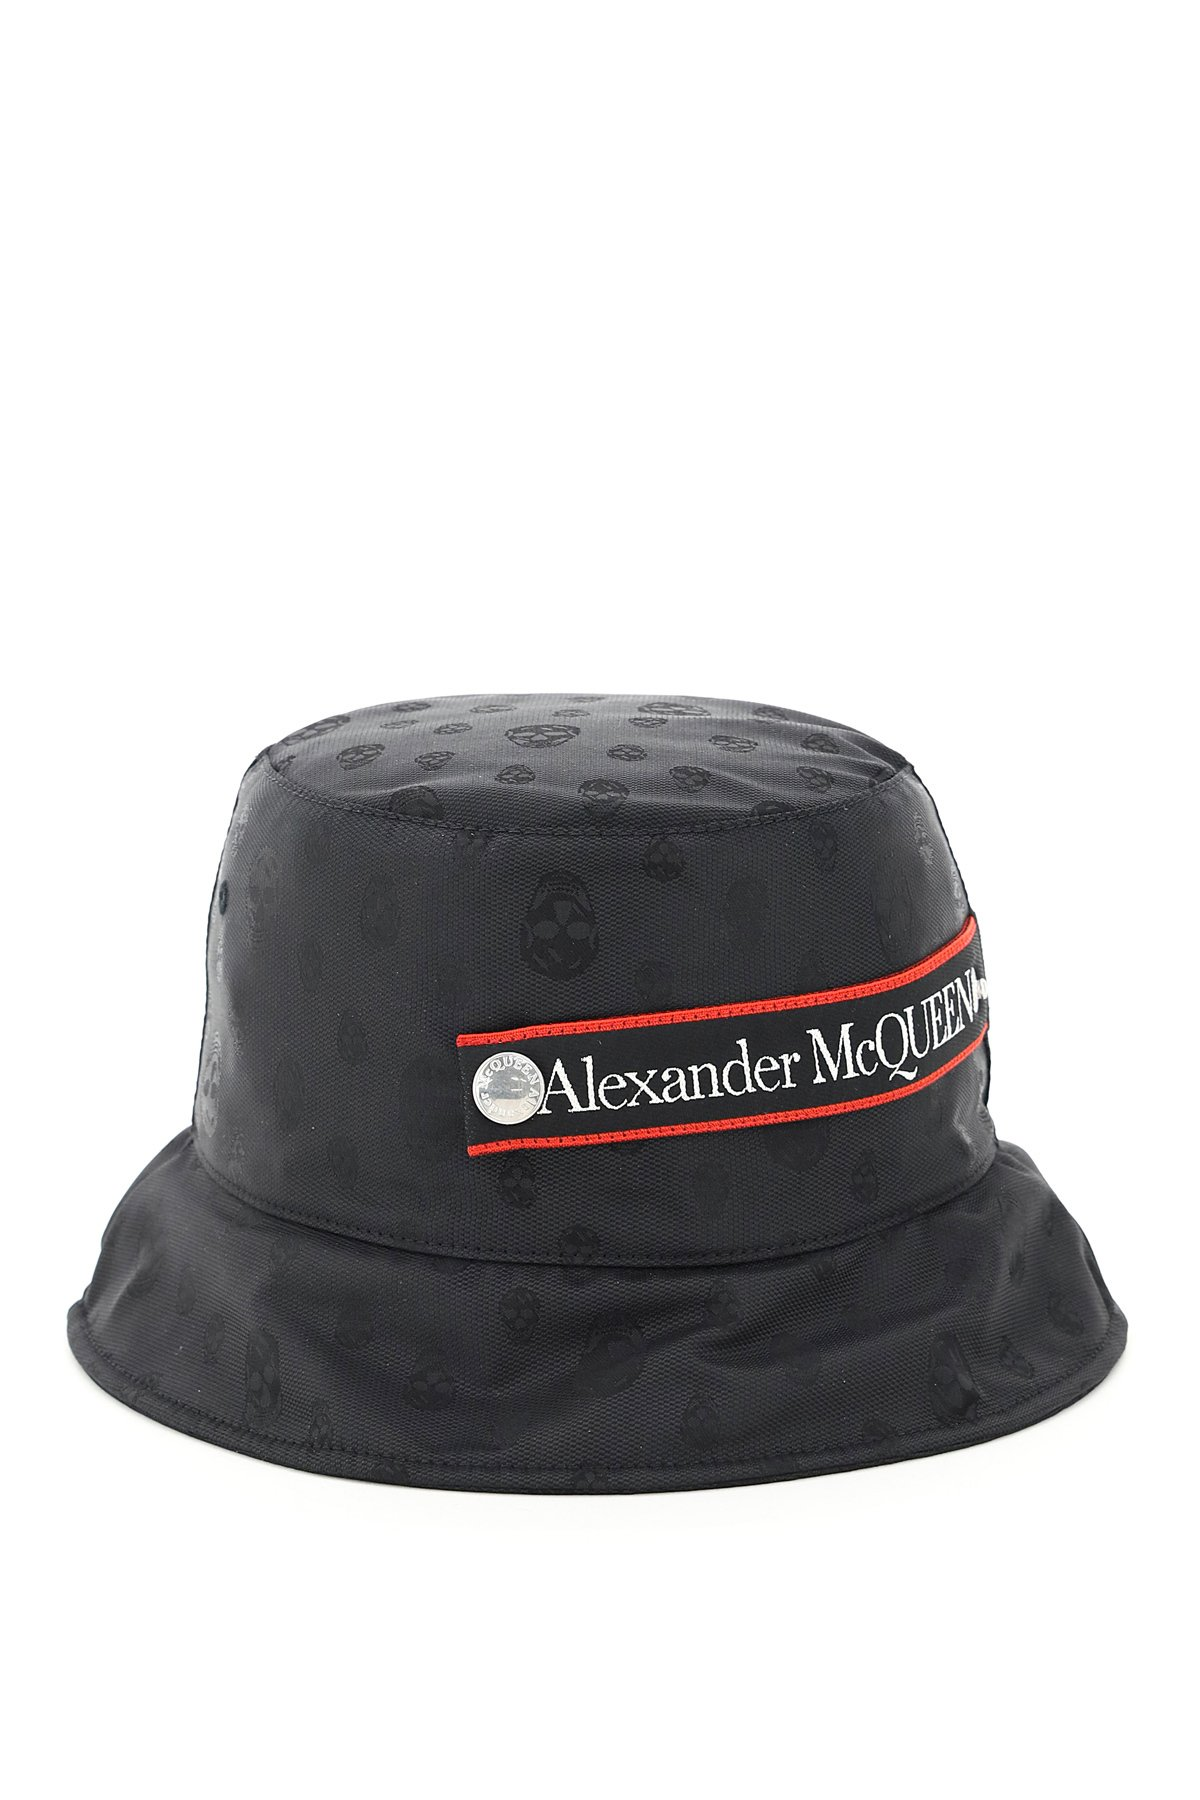 Alexander mcqueen cappello jacquard skull nastro logo